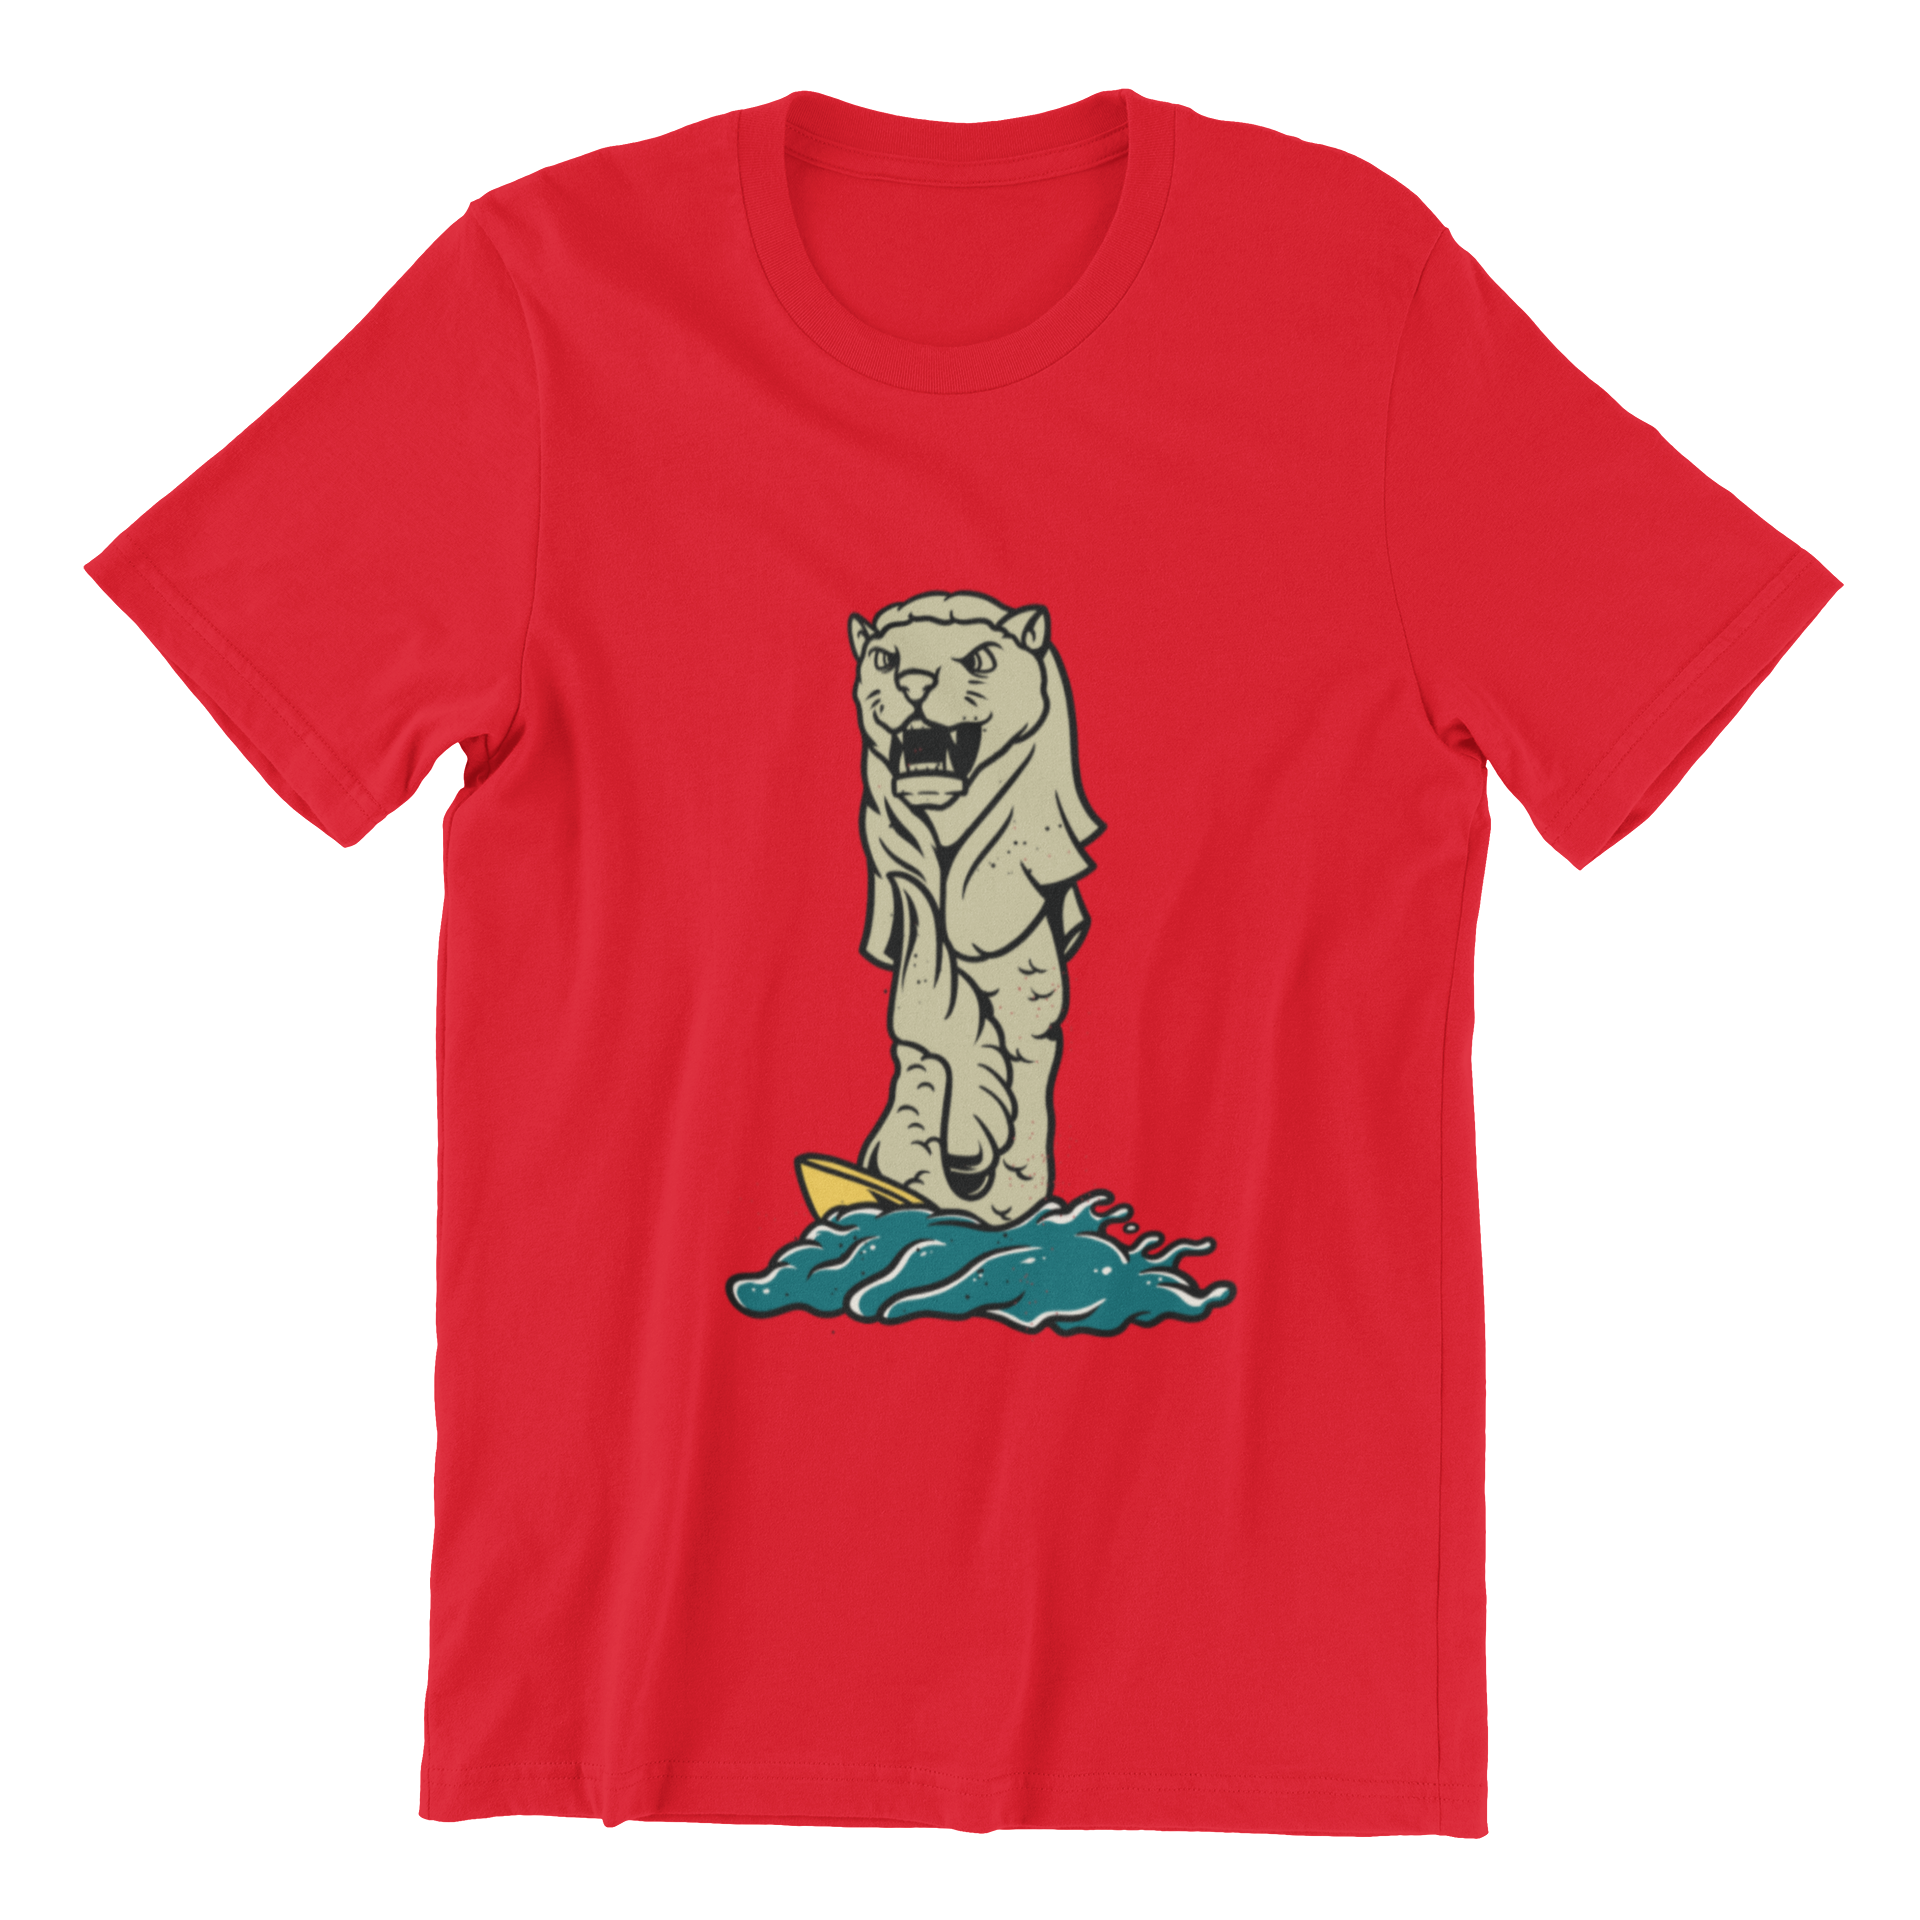 Merlion Short Sleeve T-shirt